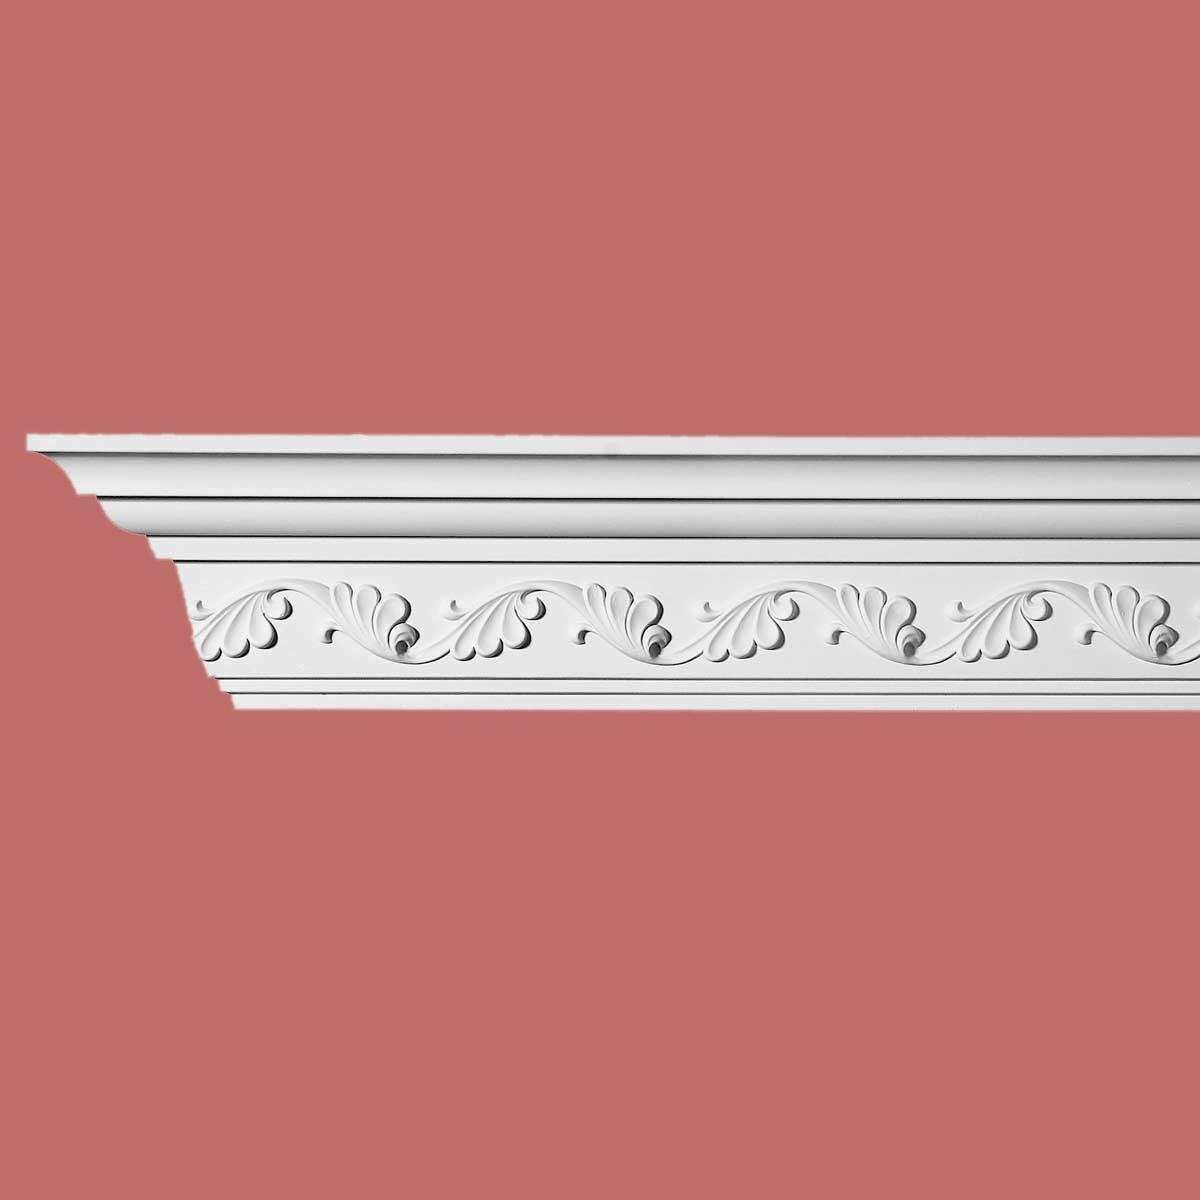 Cornice White Urethane Sample of 10984 23.5 Long Cornice Cornice Moulding Cornice Molding